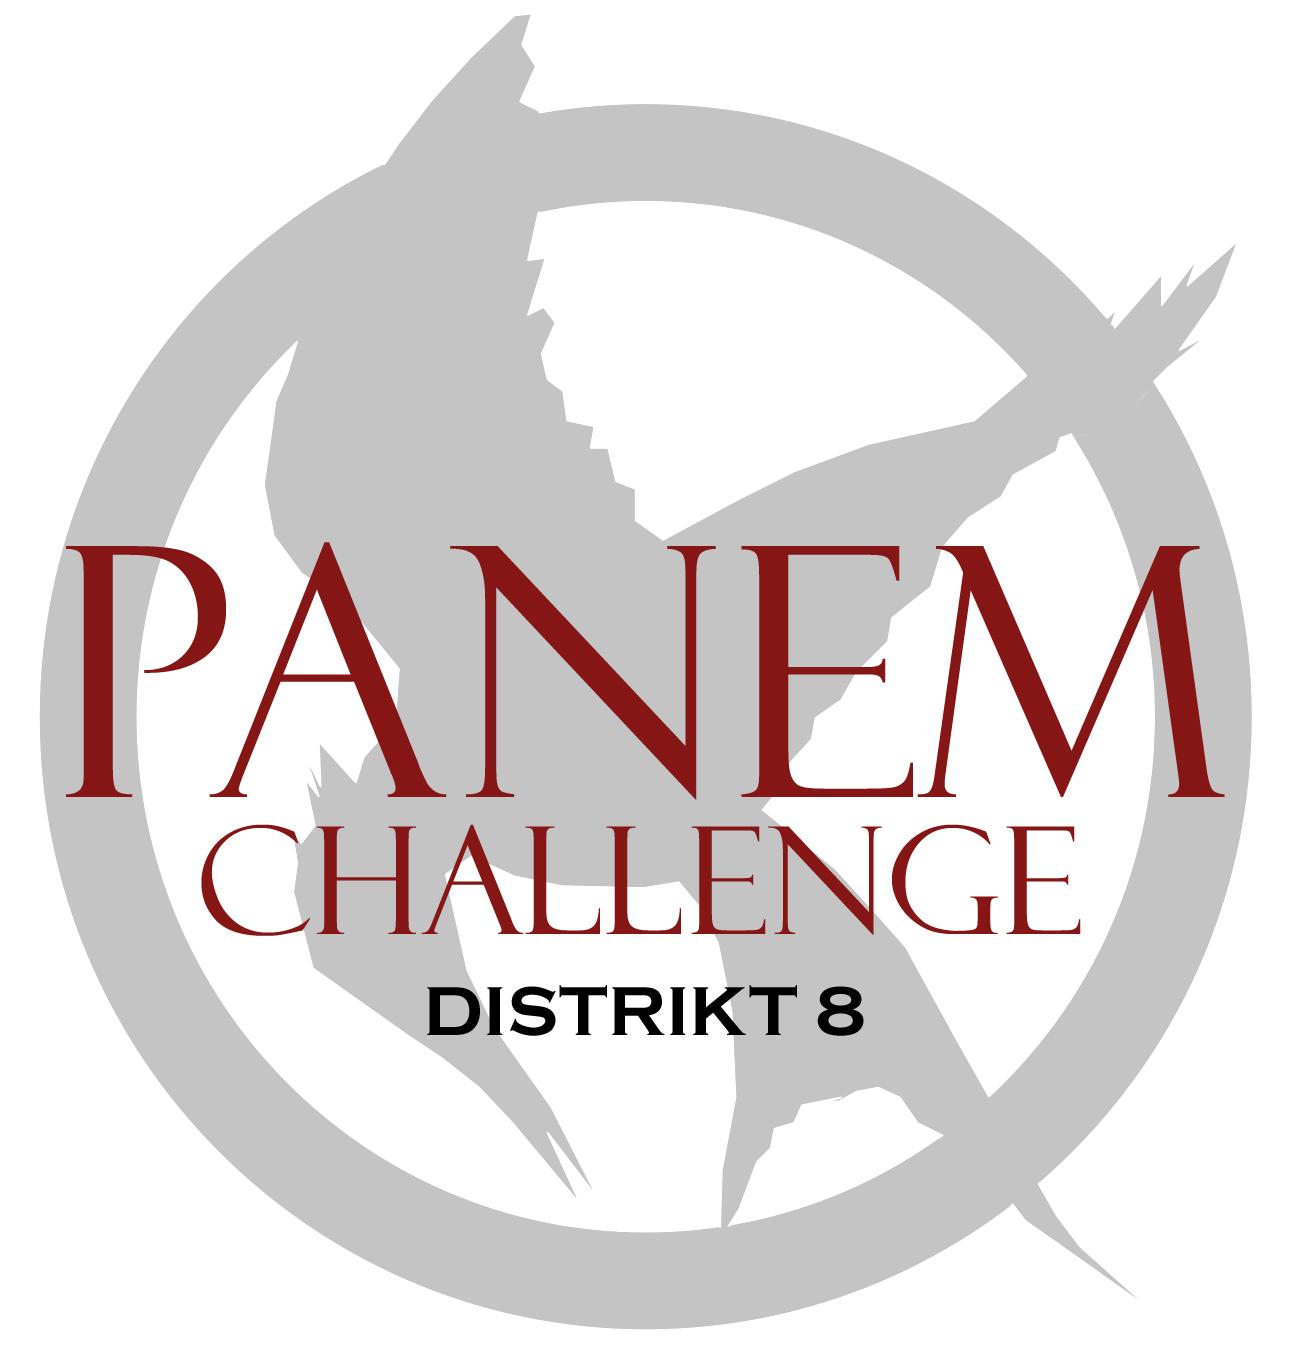 PANEM CHALLENGE 2017